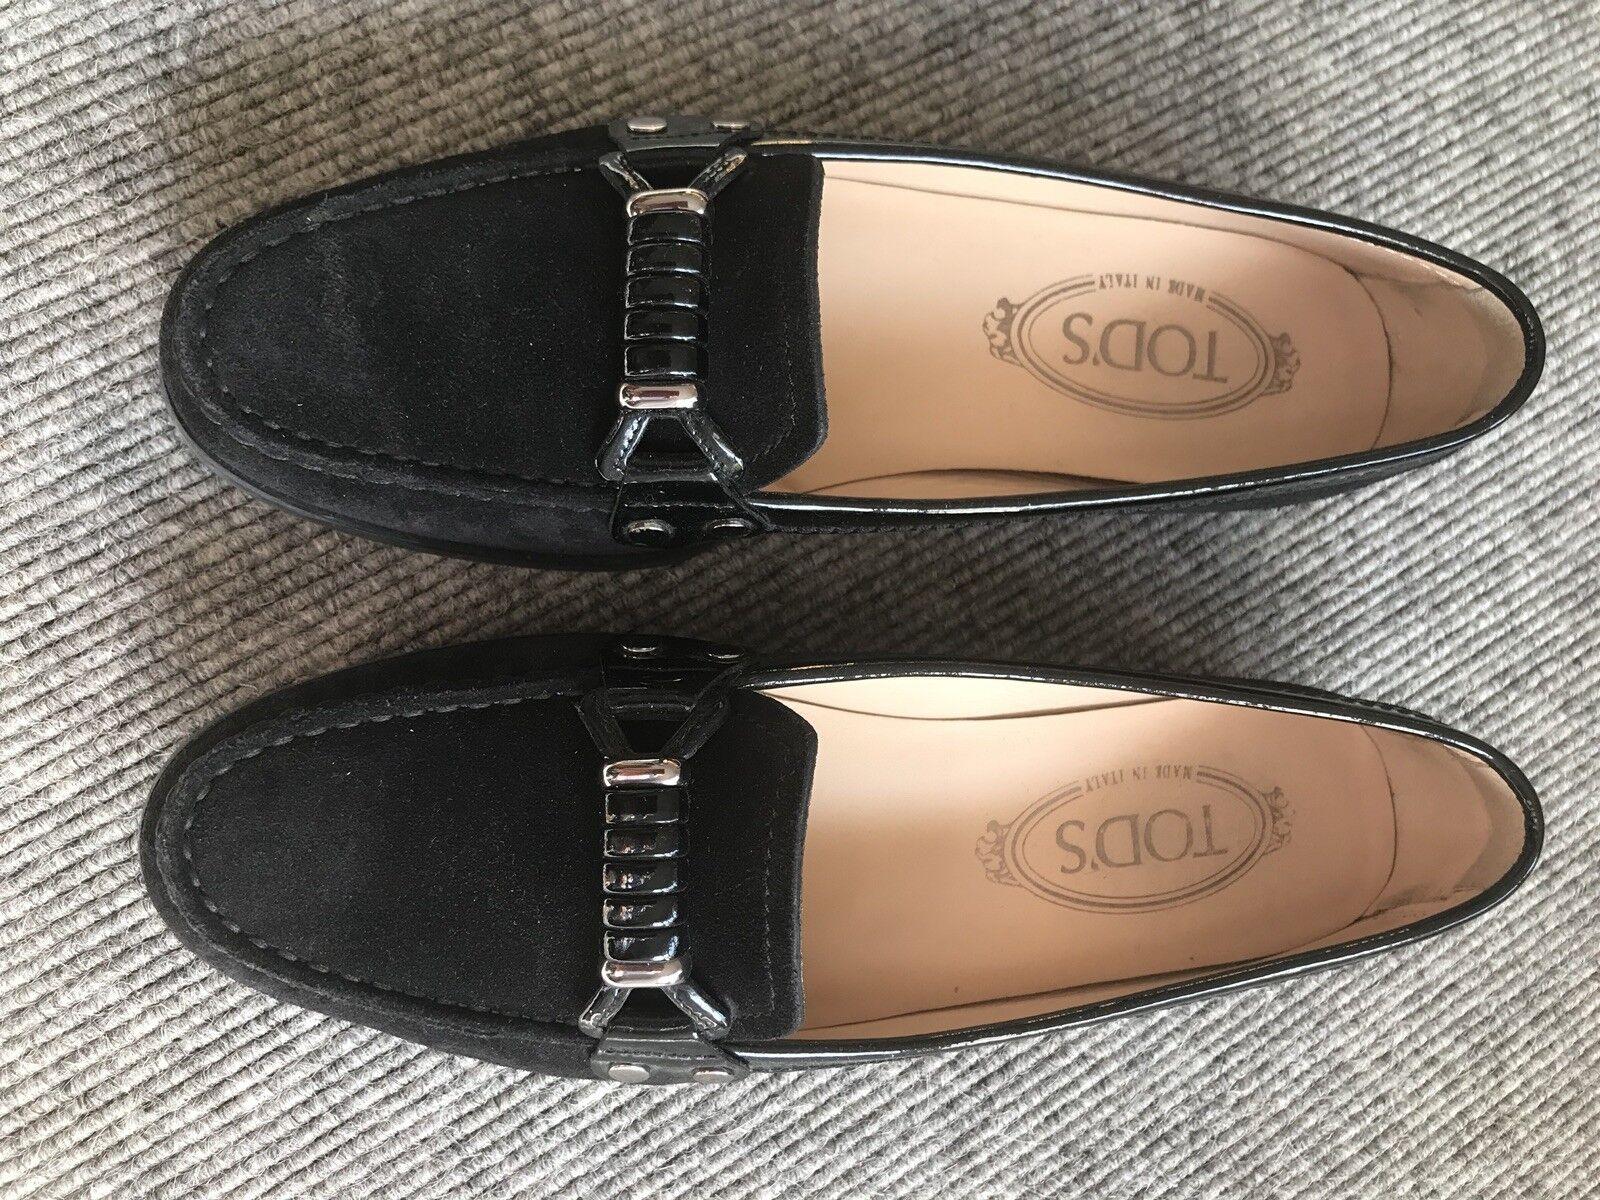 Tods Damenschuhe Loafer 38 Schwarz Lack-Velourleder Mix wie neu